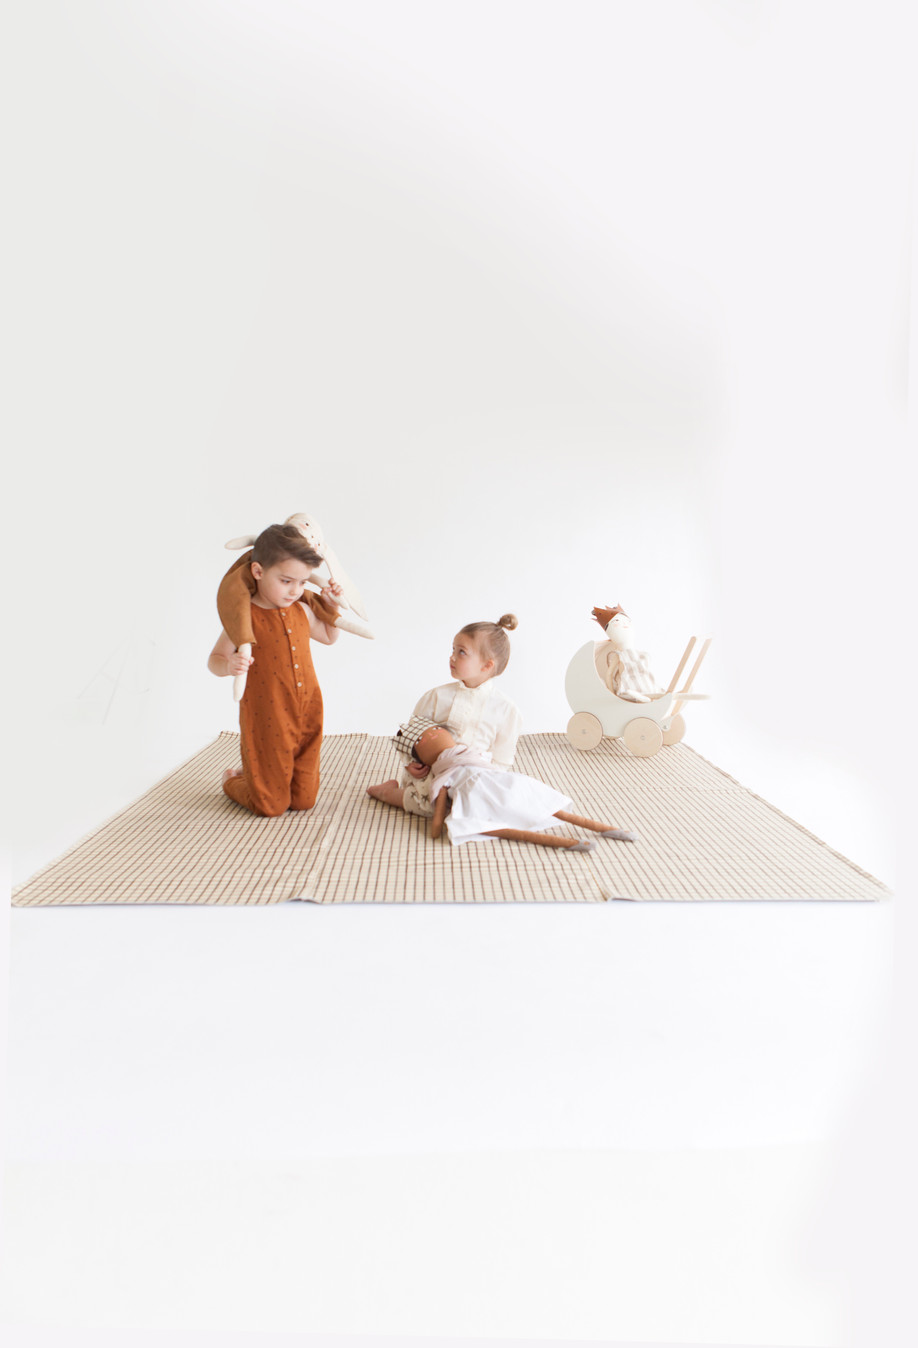 Merrilee Liddiard Dolls for the Gathre/Rylee + Cru collab